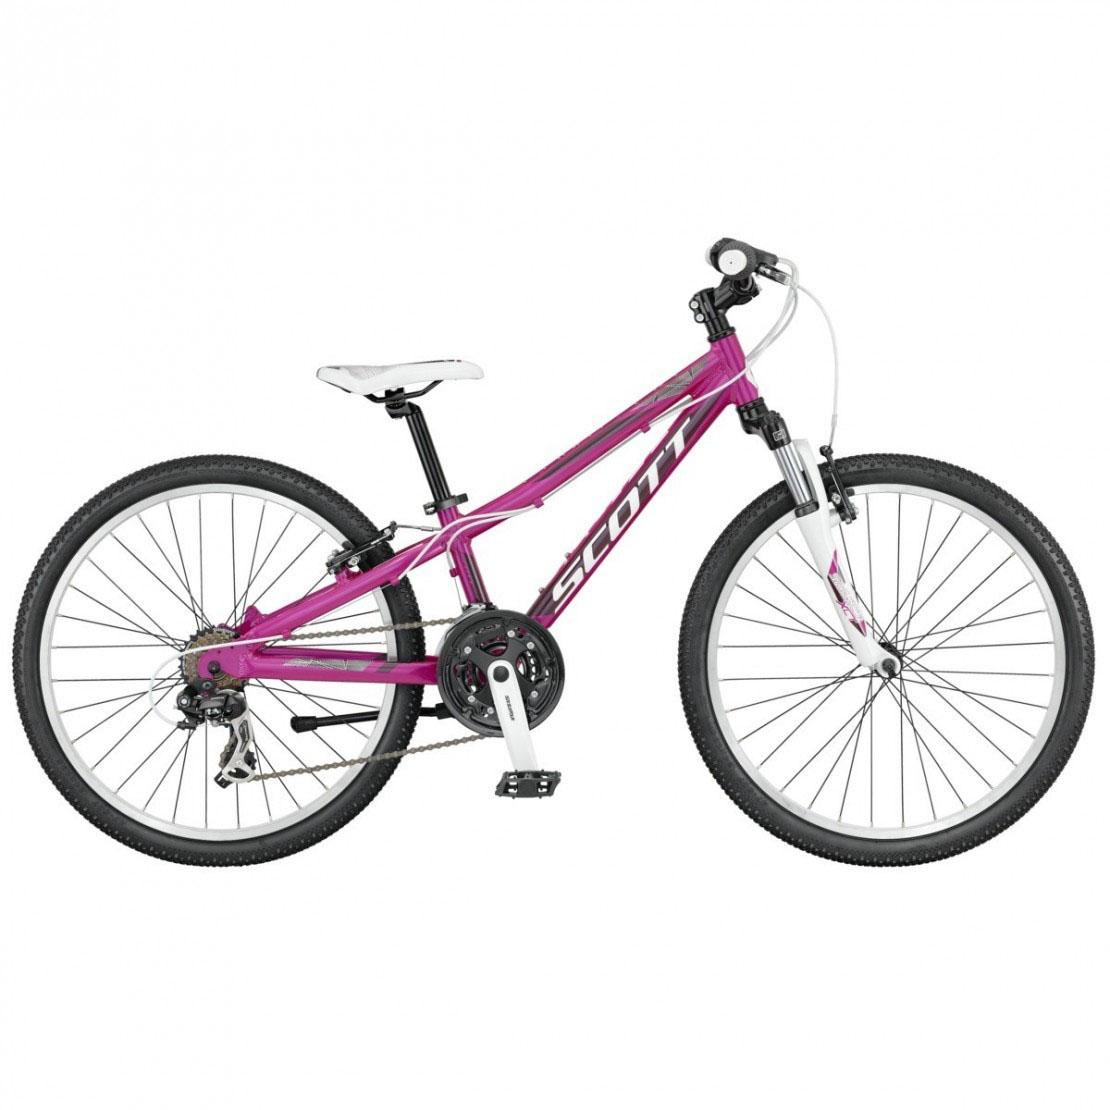 Scott Contessa Jr 24 2016 Girls Kids Bike on 5 Feet 3 Inches